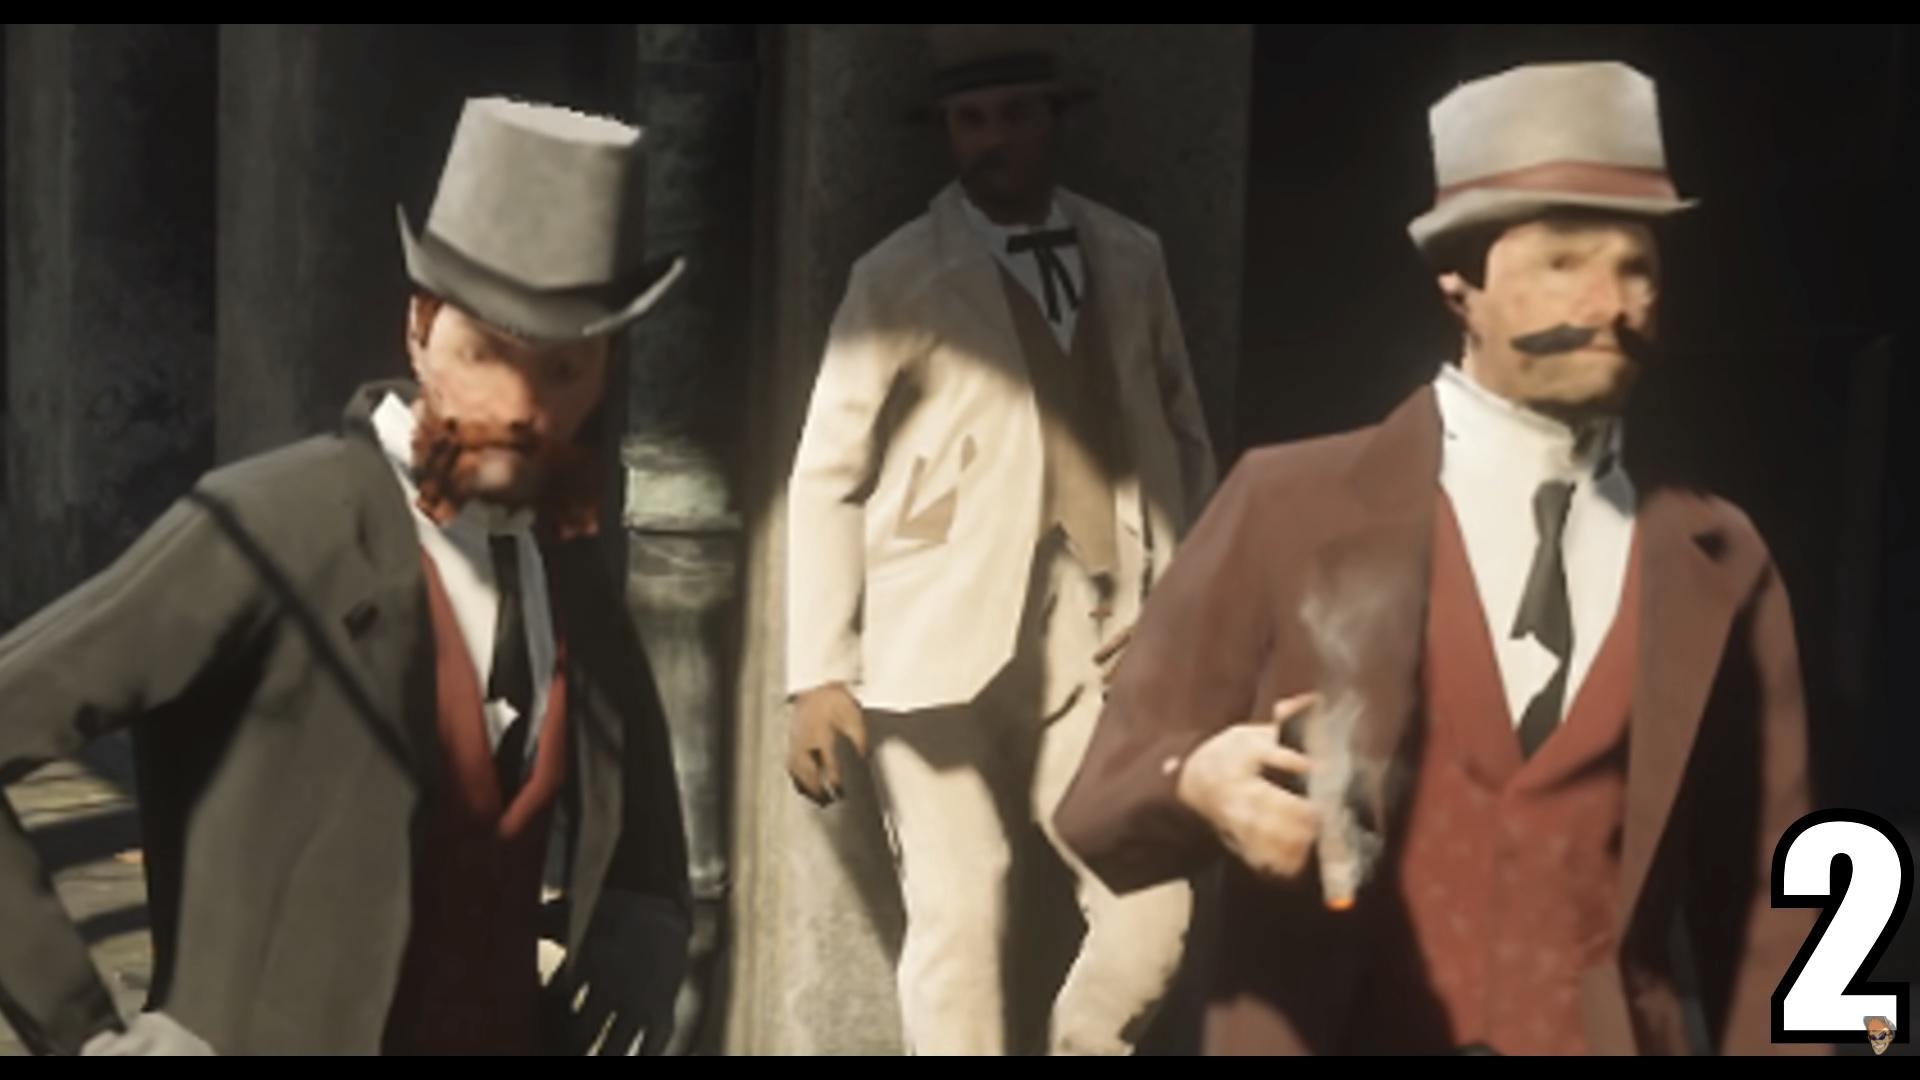 Геймдев: Как устроена Red Dead Redemption 2 за кадром